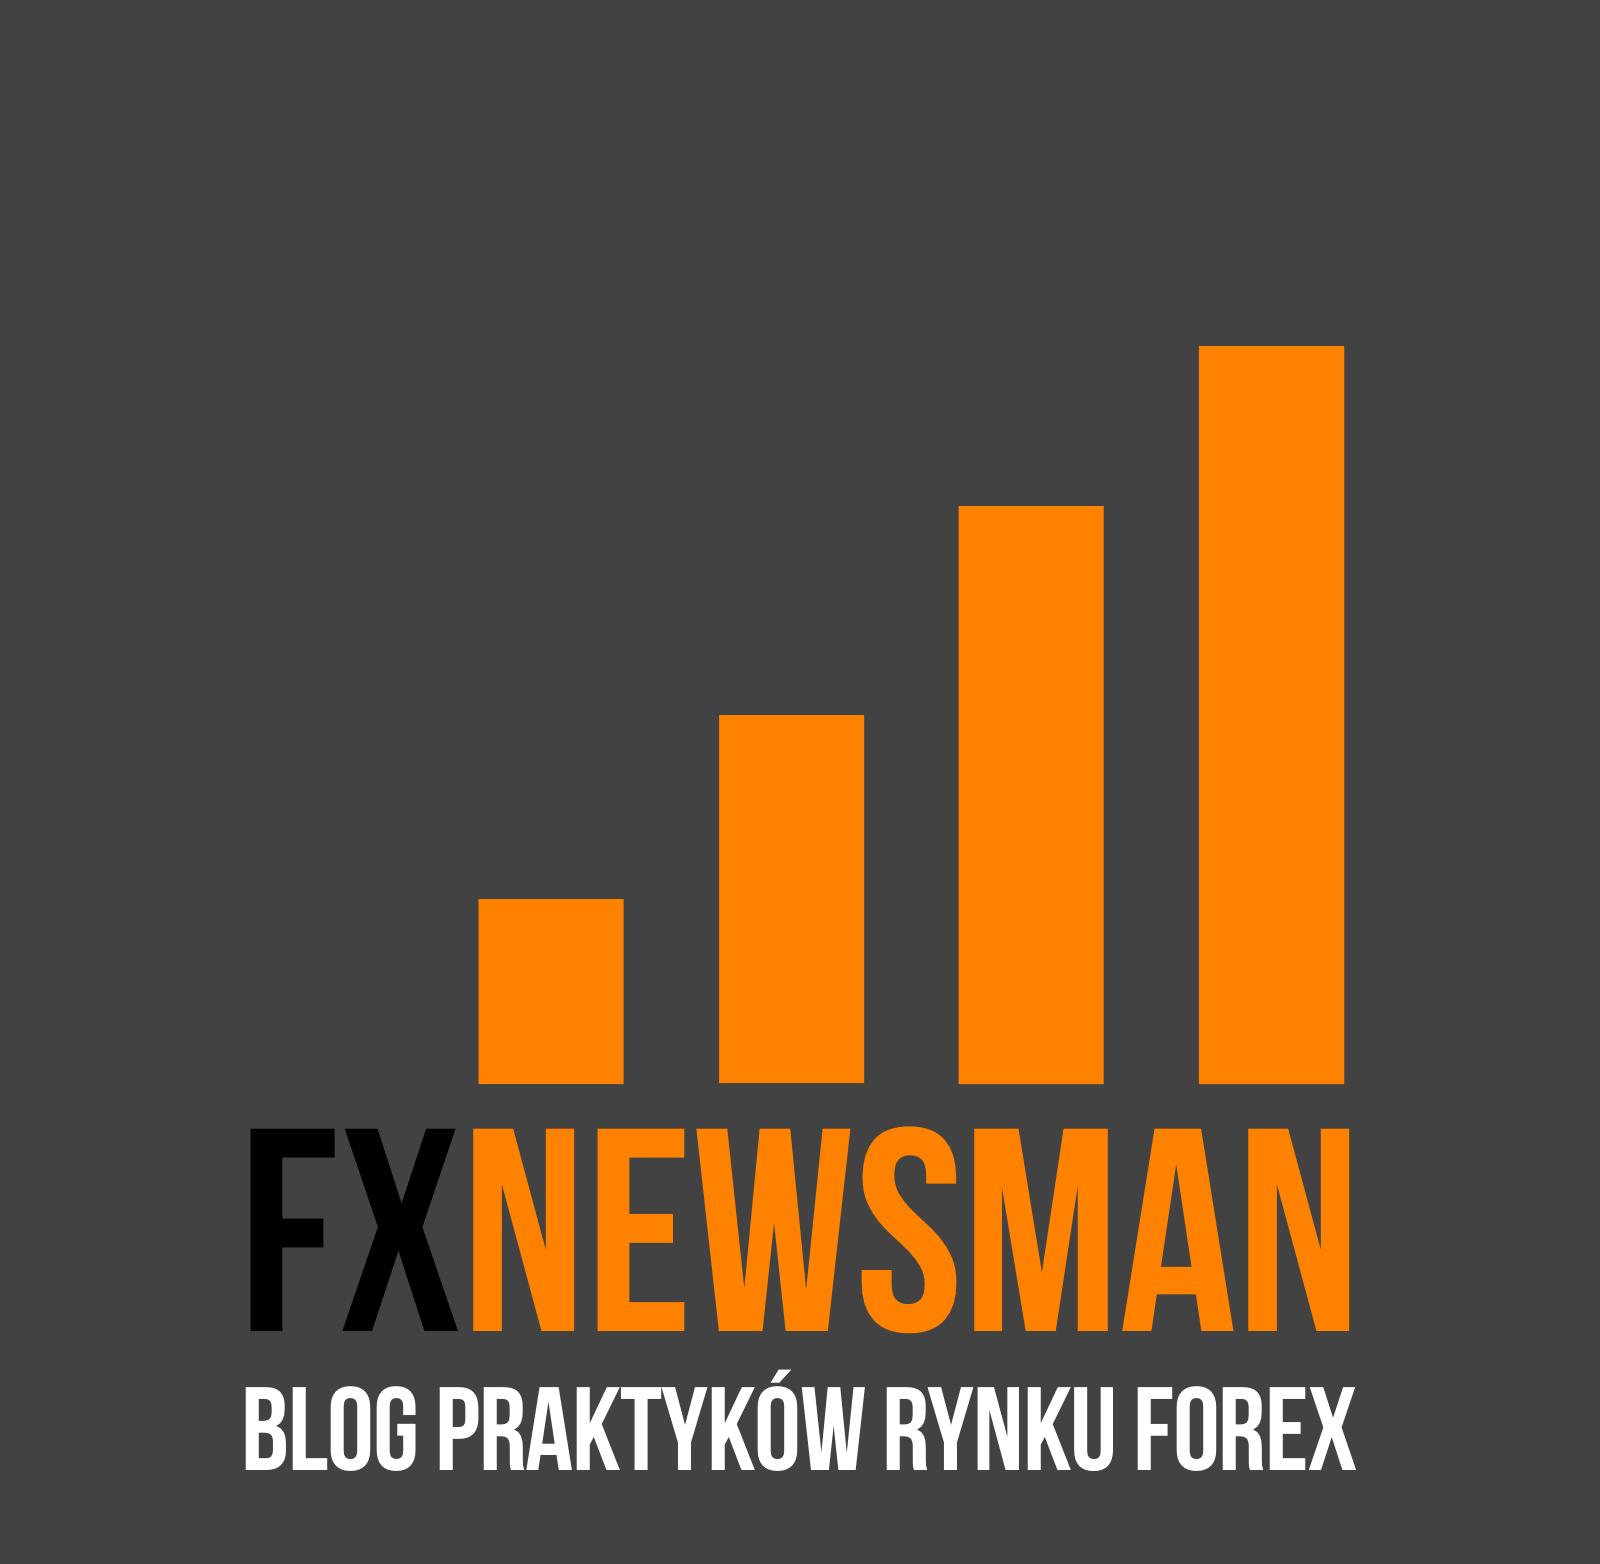 FX Newsman logo